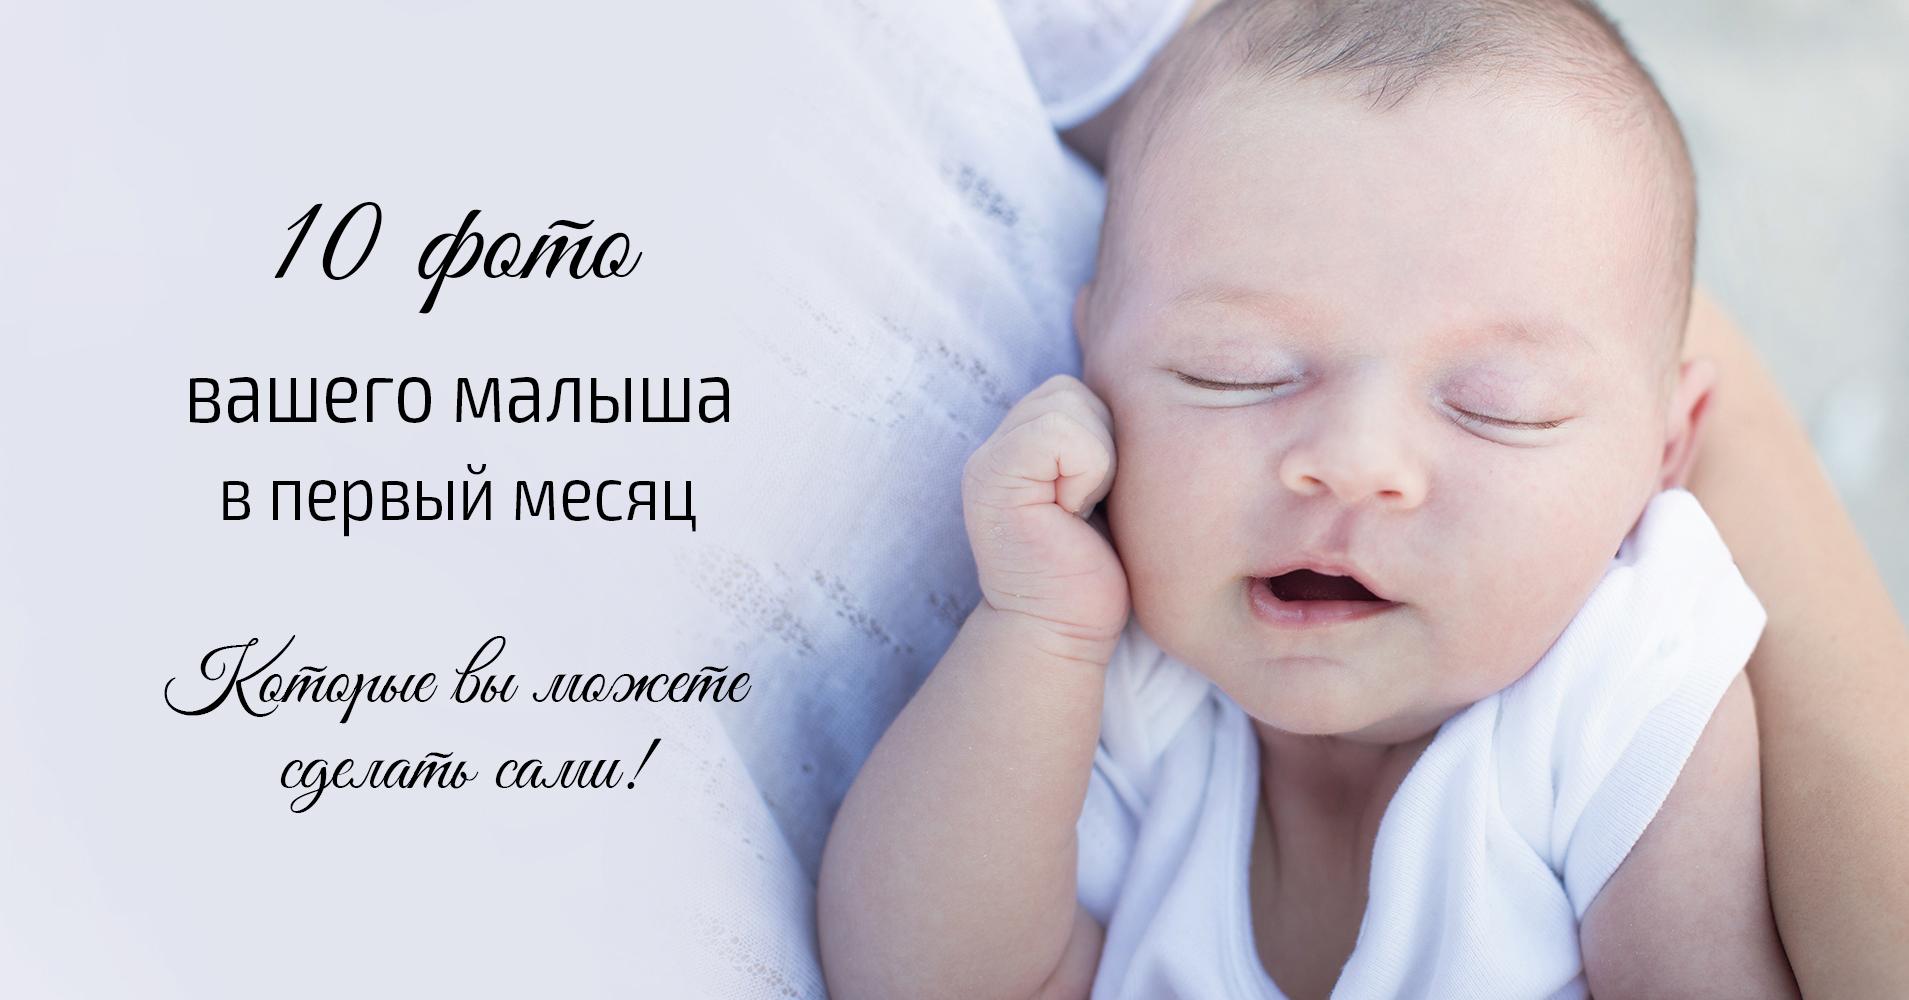 10photo.jpg